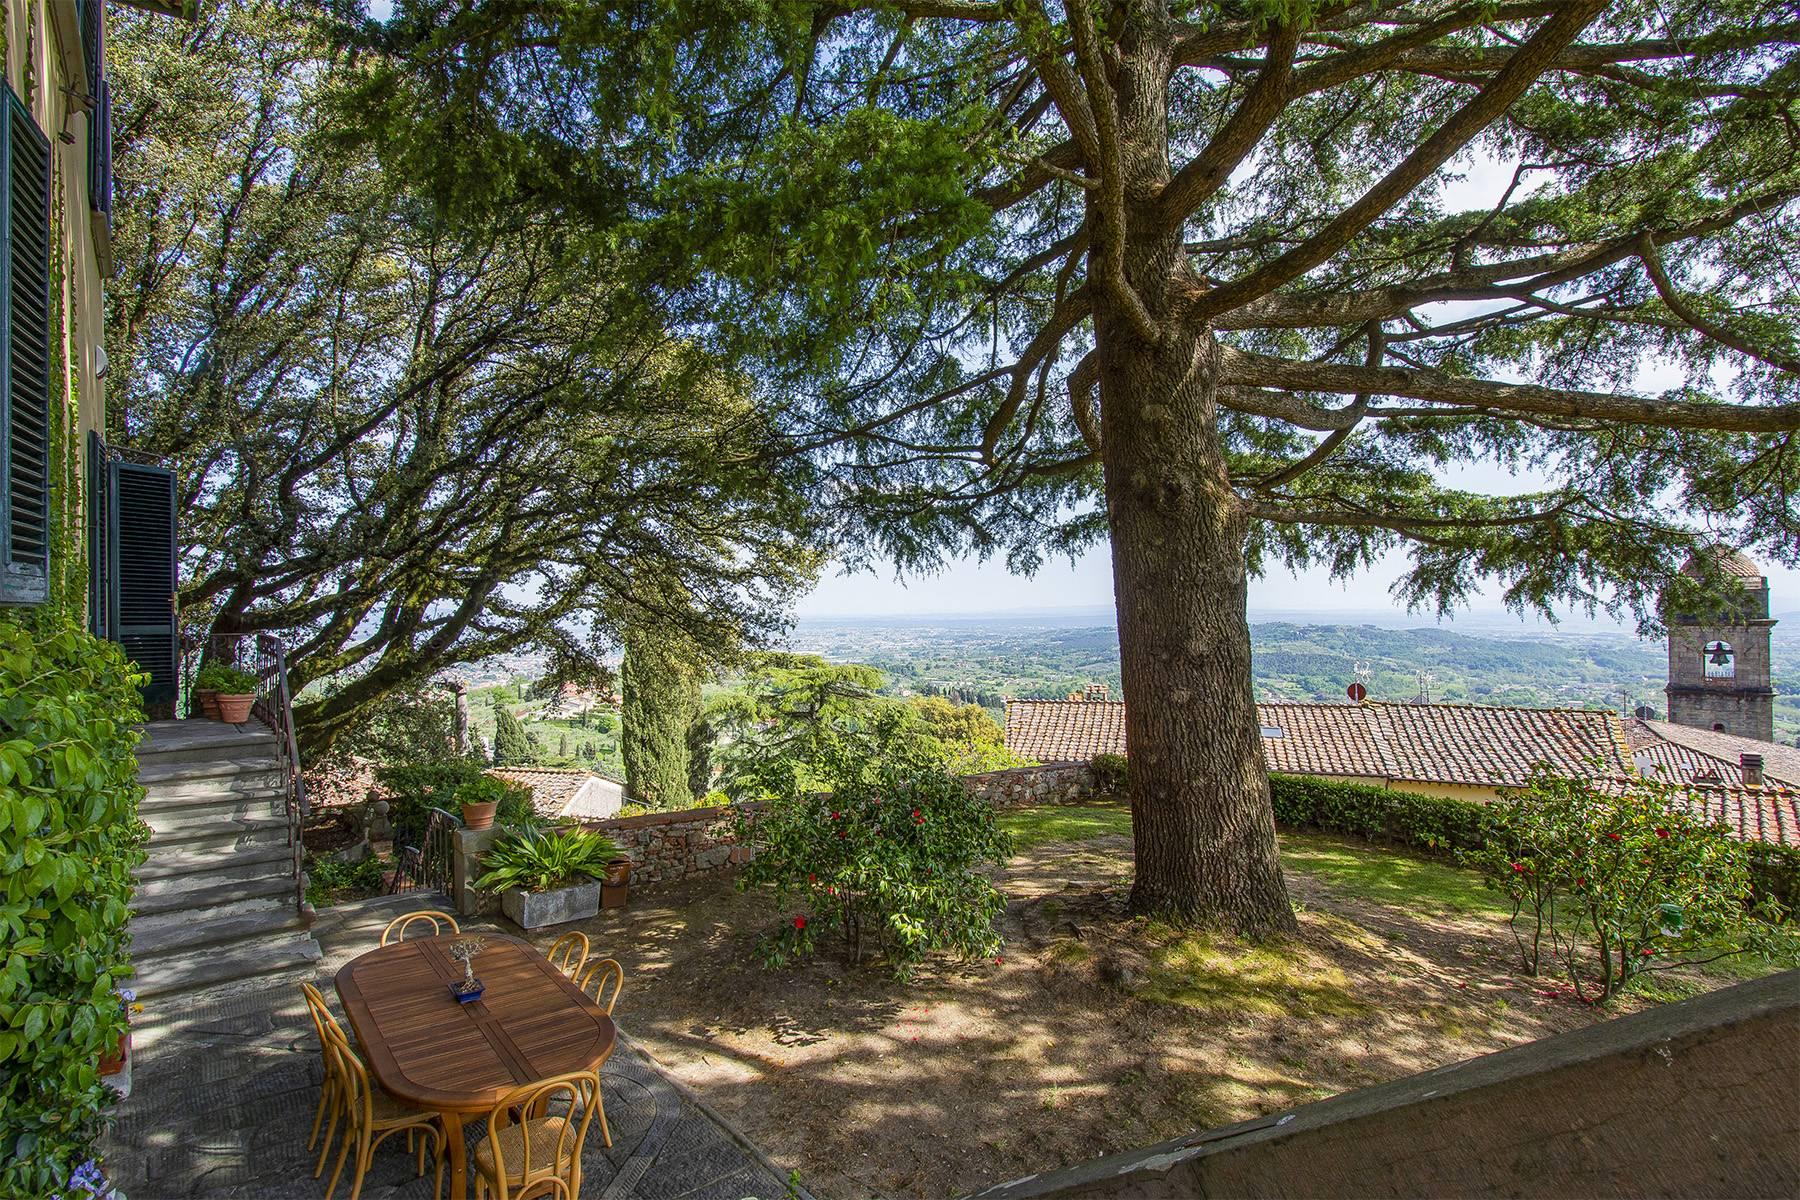 Villa in Vendita a Capannori: 5 locali, 380 mq - Foto 26